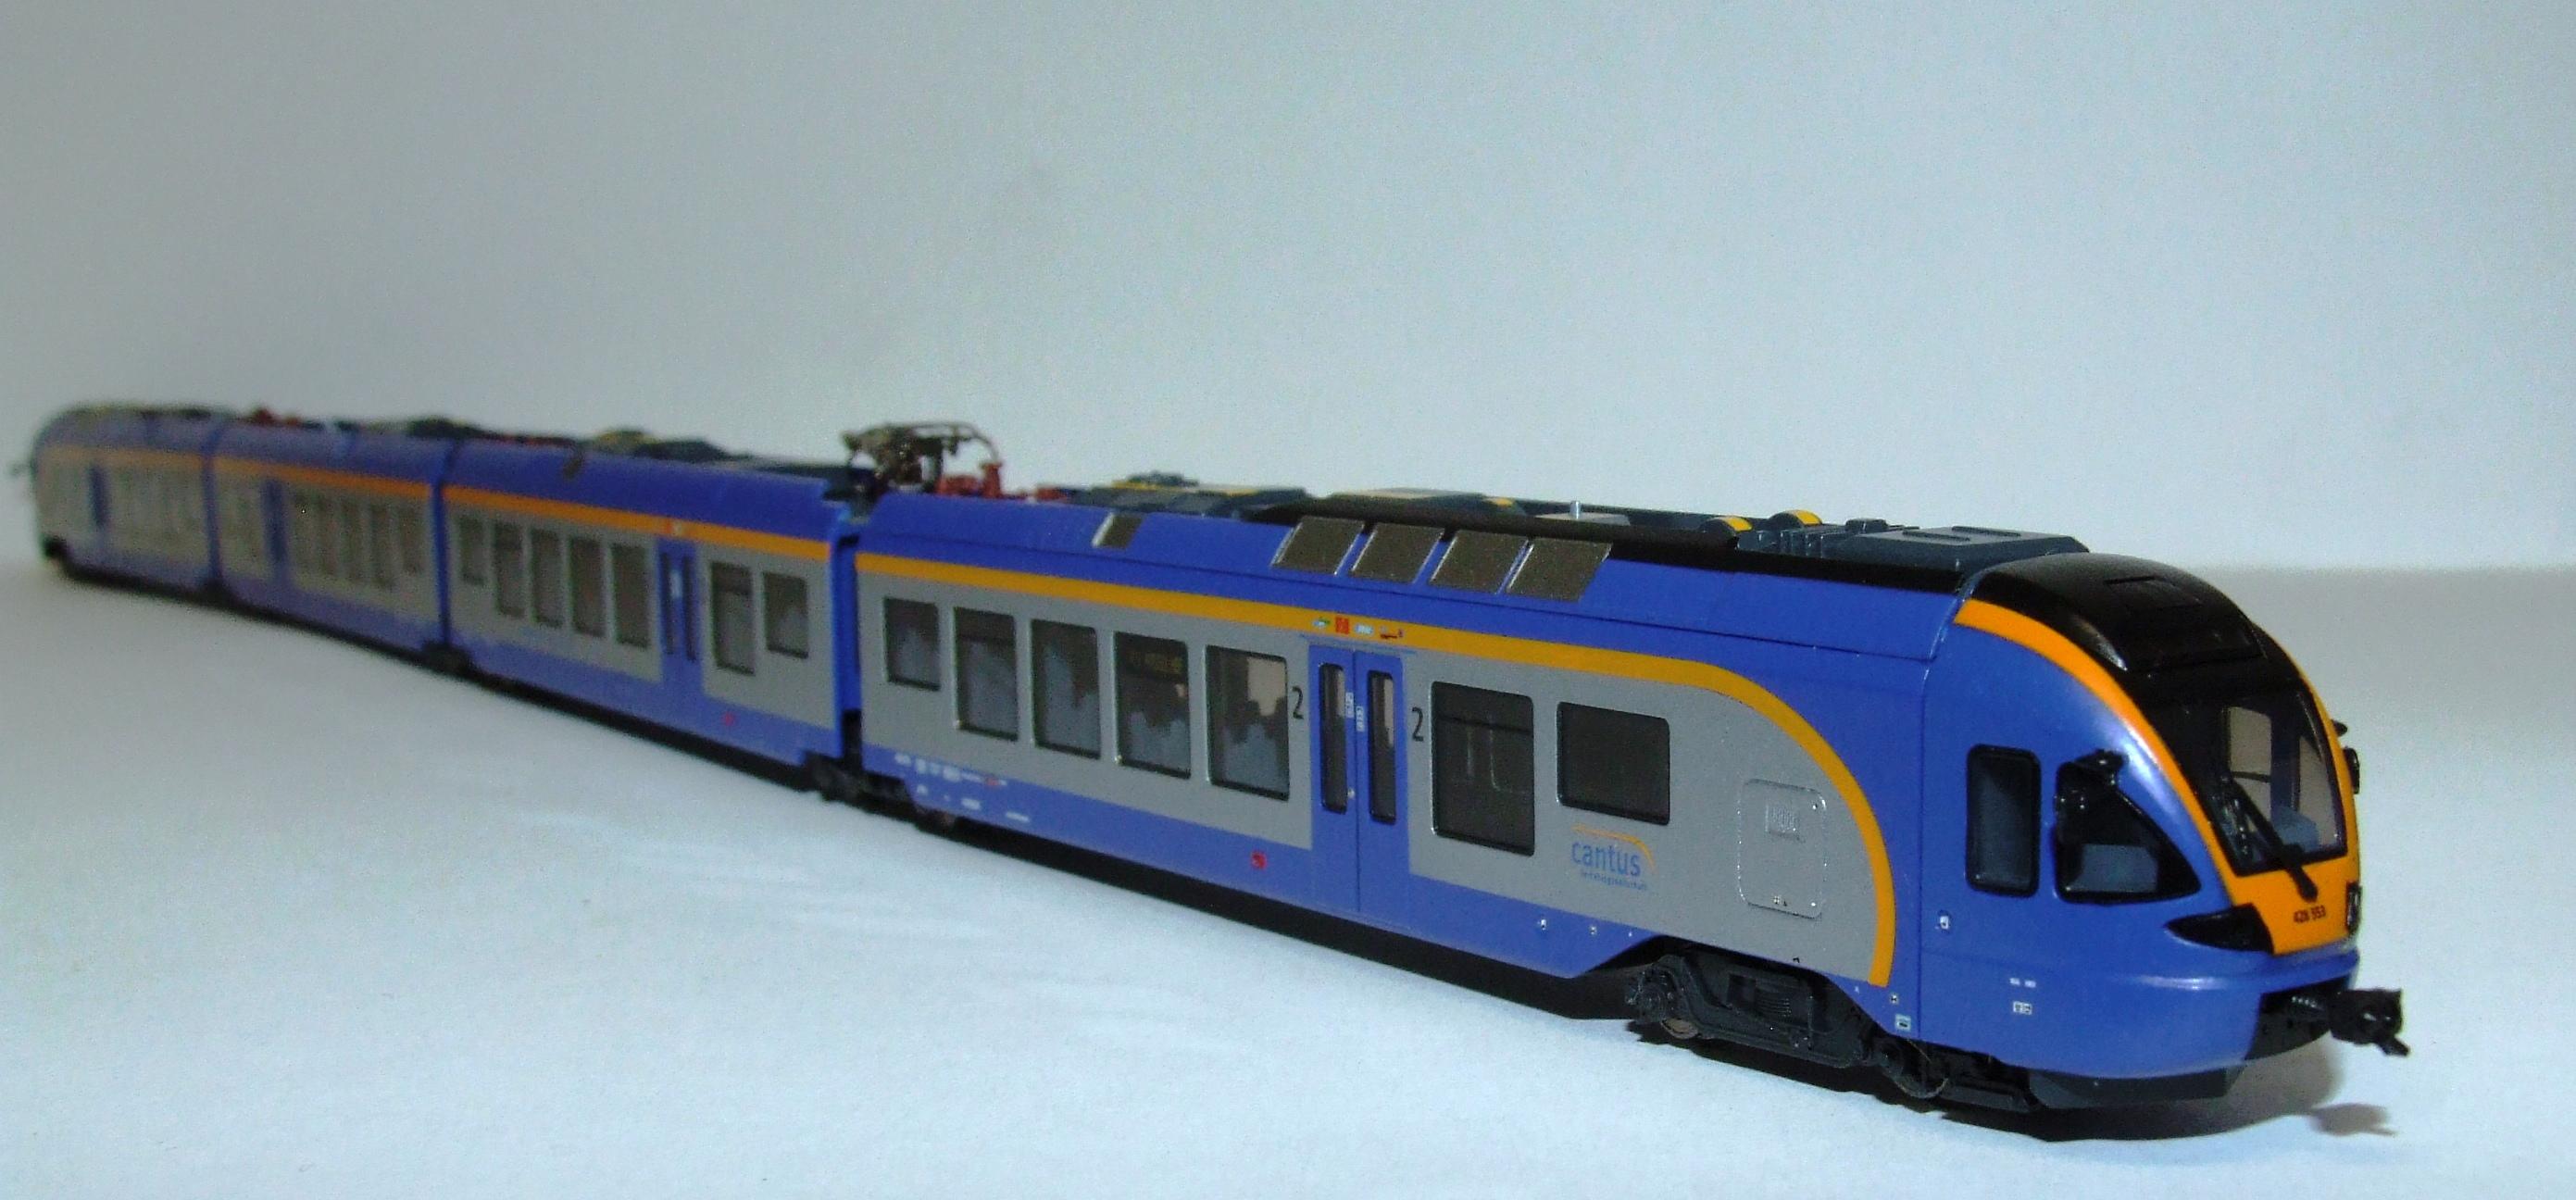 LAN157 Liliput L 163980 Spur N 4tlg. elektr. Triebwagen der Cantus